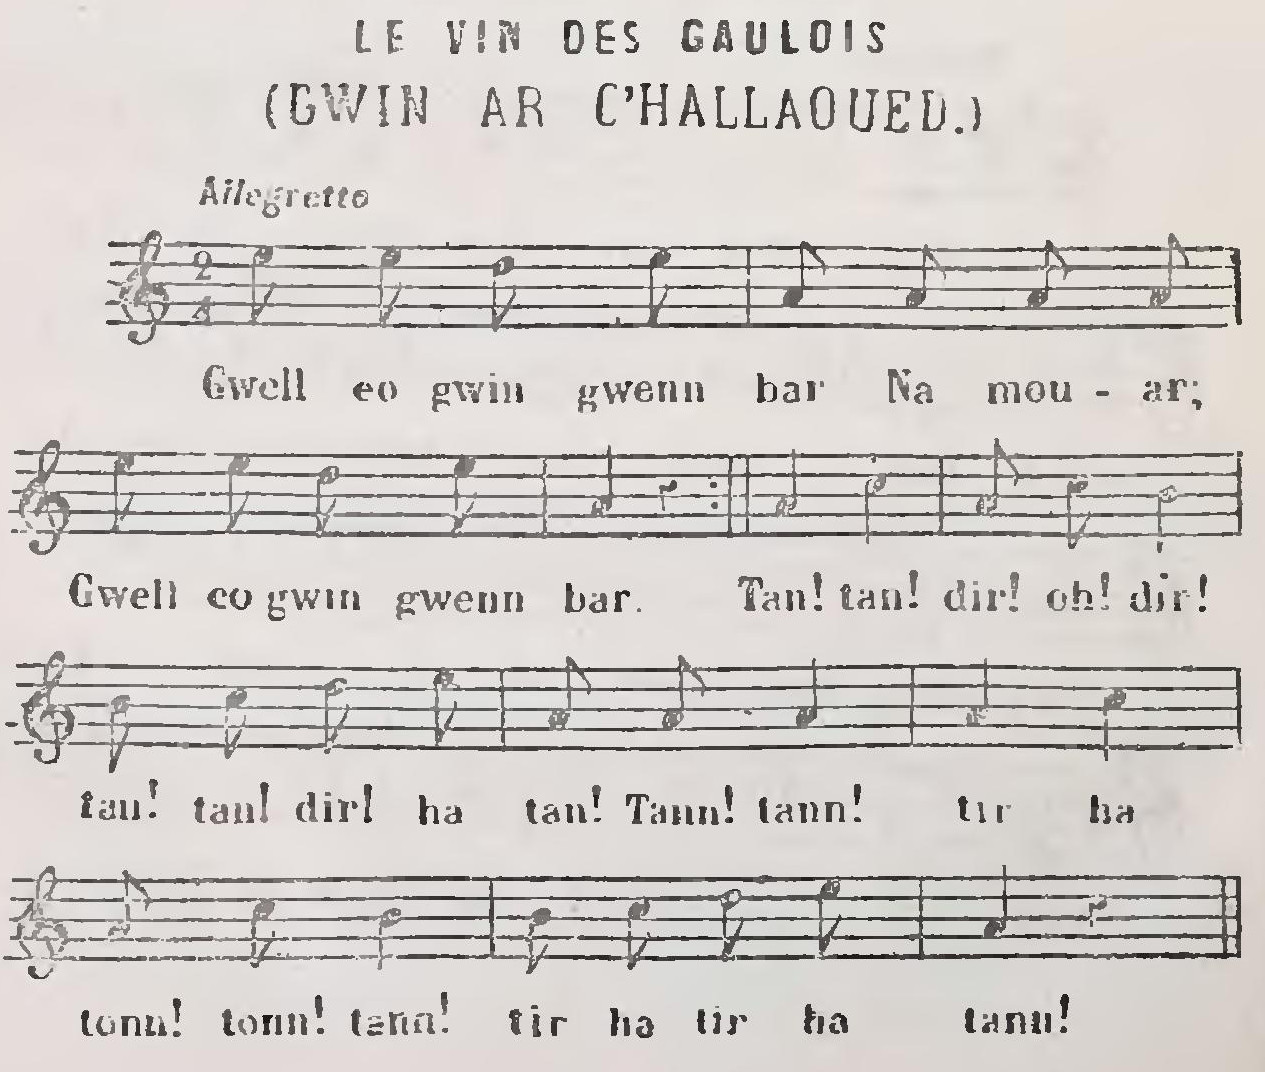 Gwin ar C'hallaoued